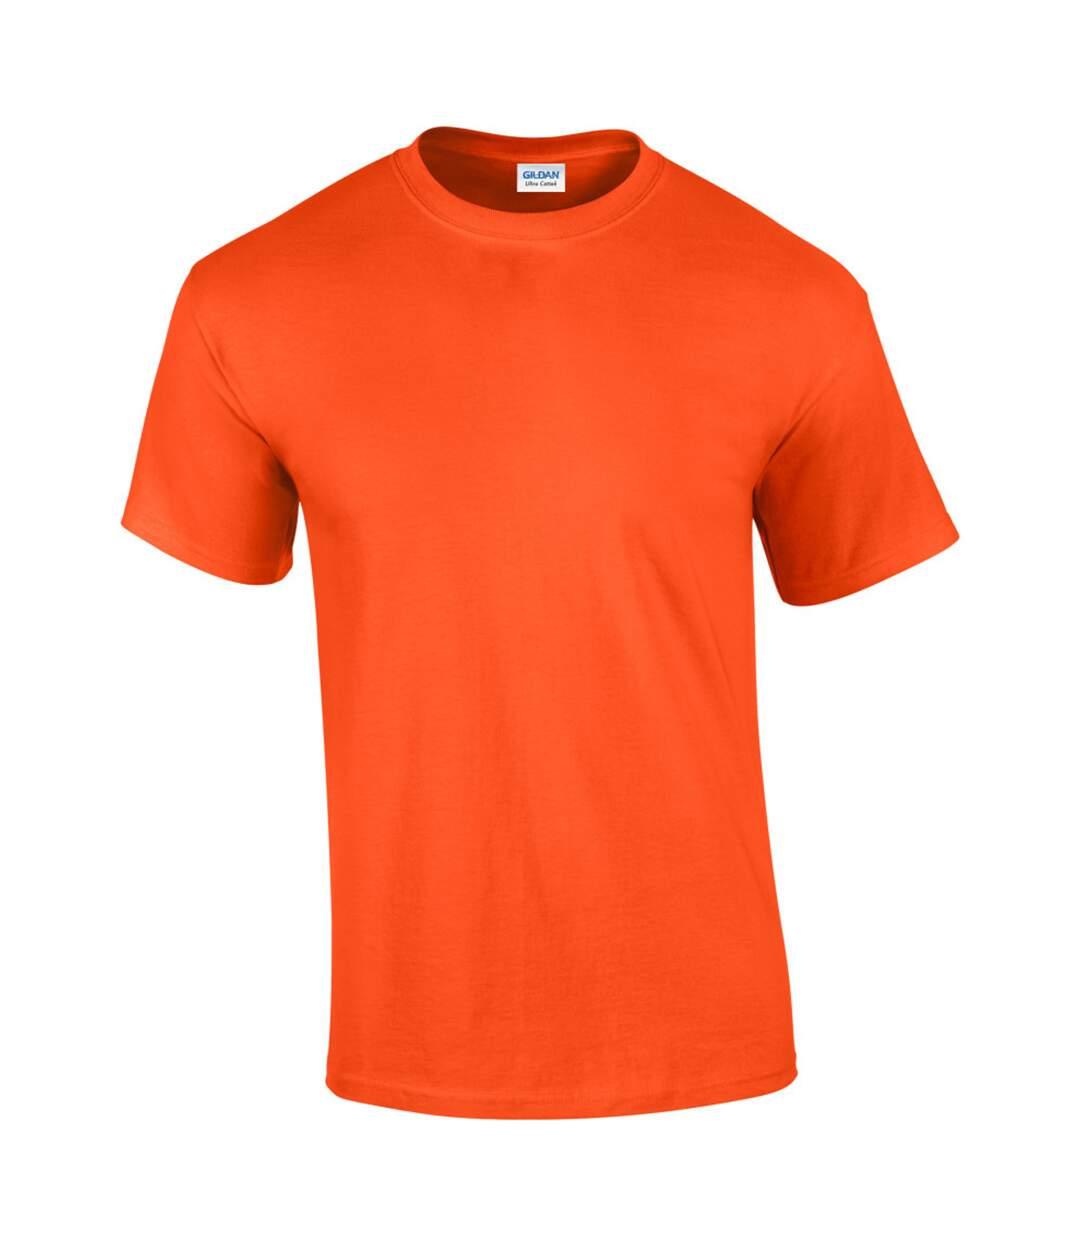 Gildan Mens Ultra Cotton Short Sleeve T-Shirt (Royal) - UTBC475